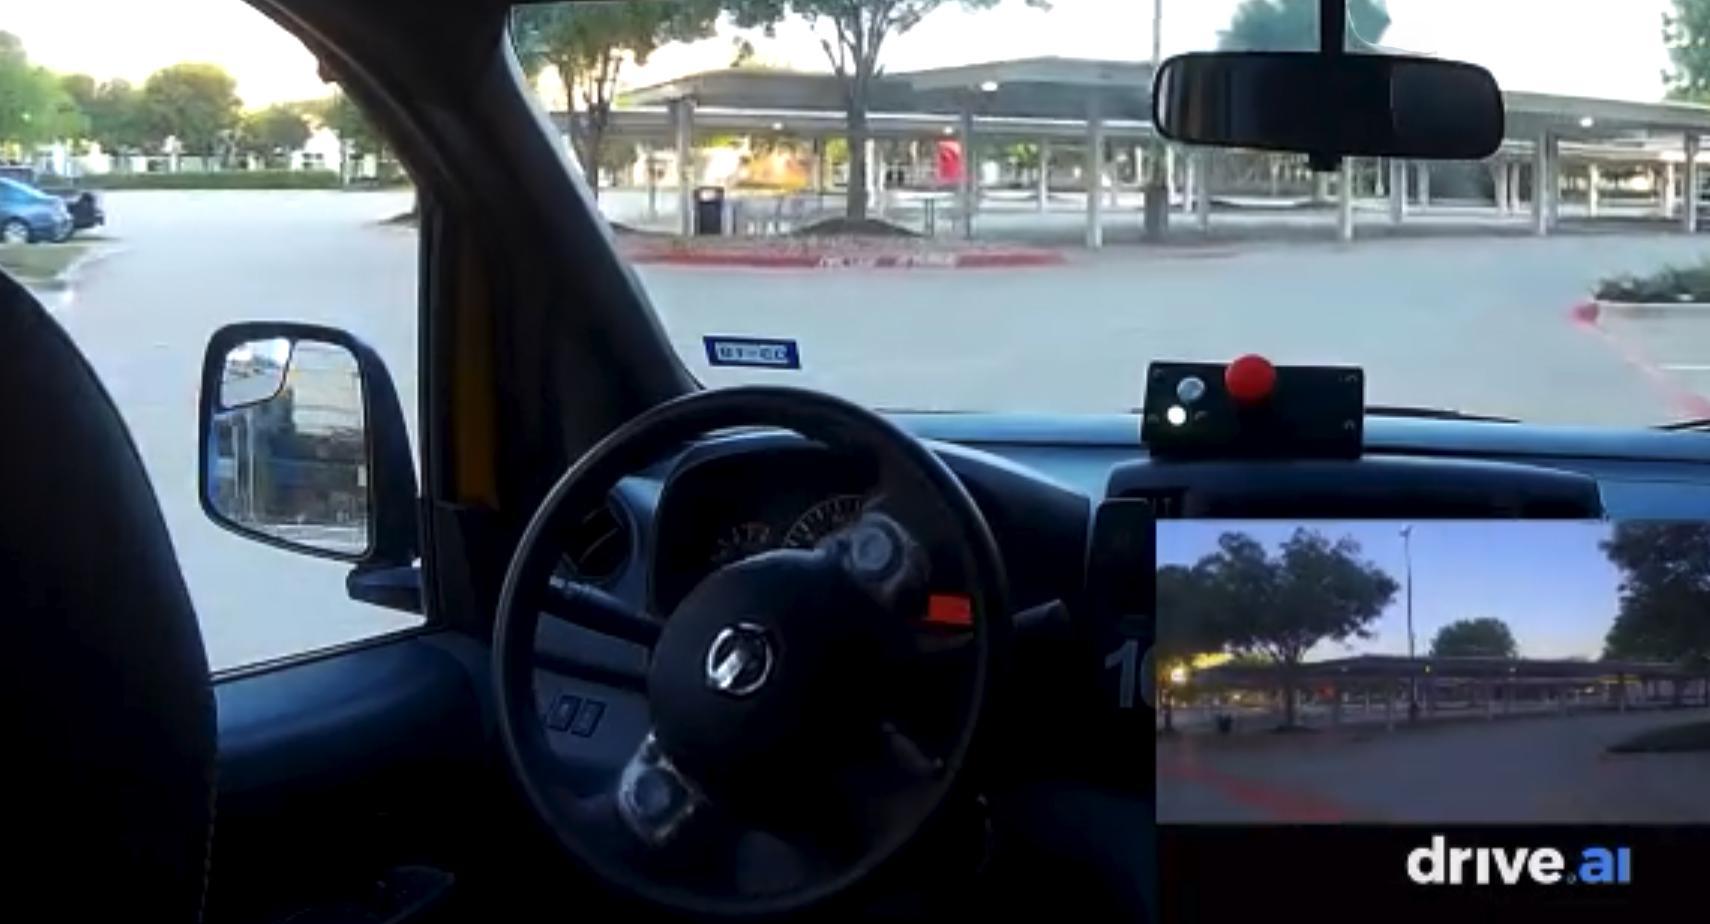 Drive.ai展示完全无人驾驶汽车上路视频